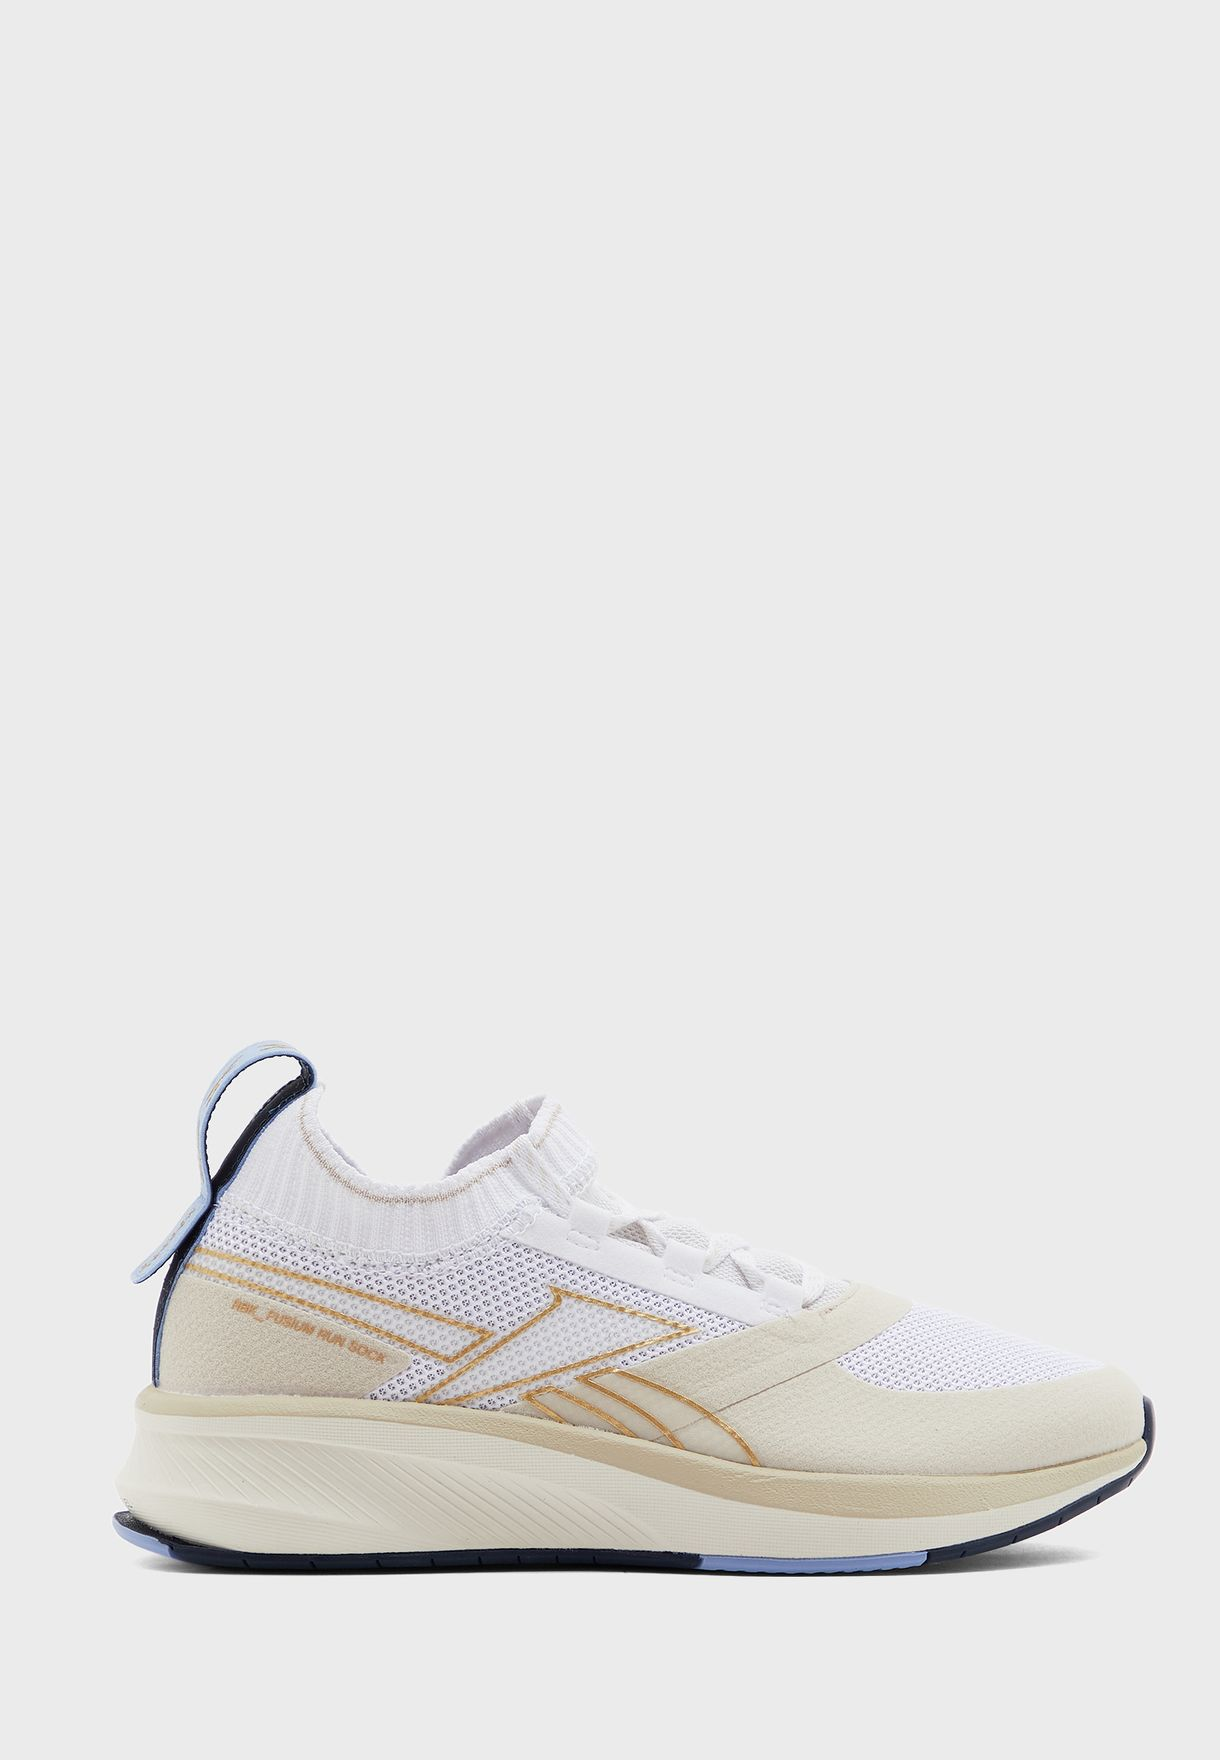 Buy Reebok White Fusium Run 20 Sock For Women In Mena Worldwide Eh0398